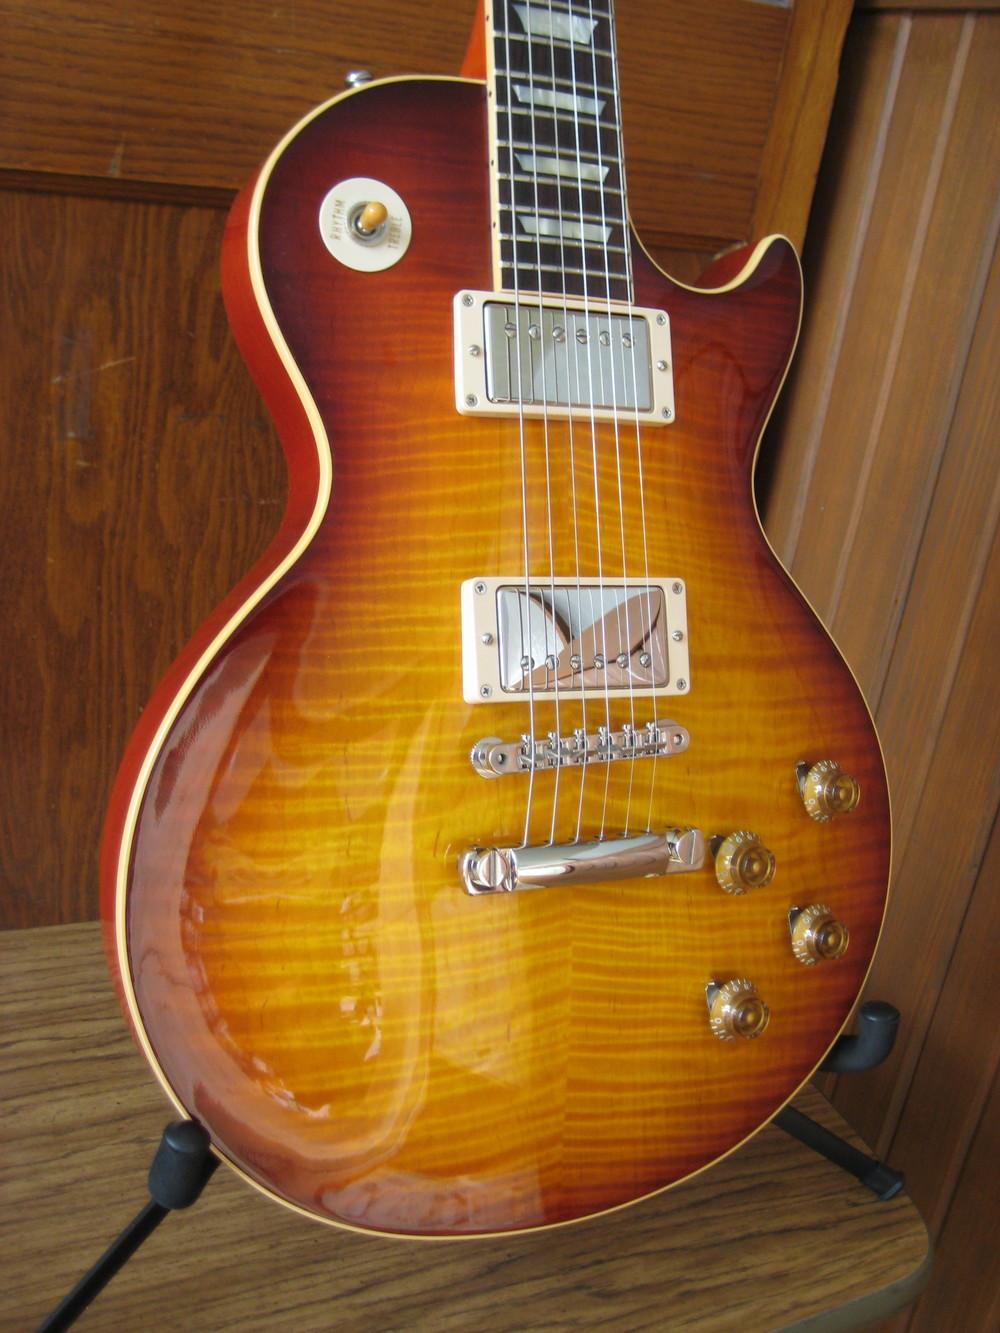 Gibson Les Paul Repair in Tulsa Guitar Technical Services